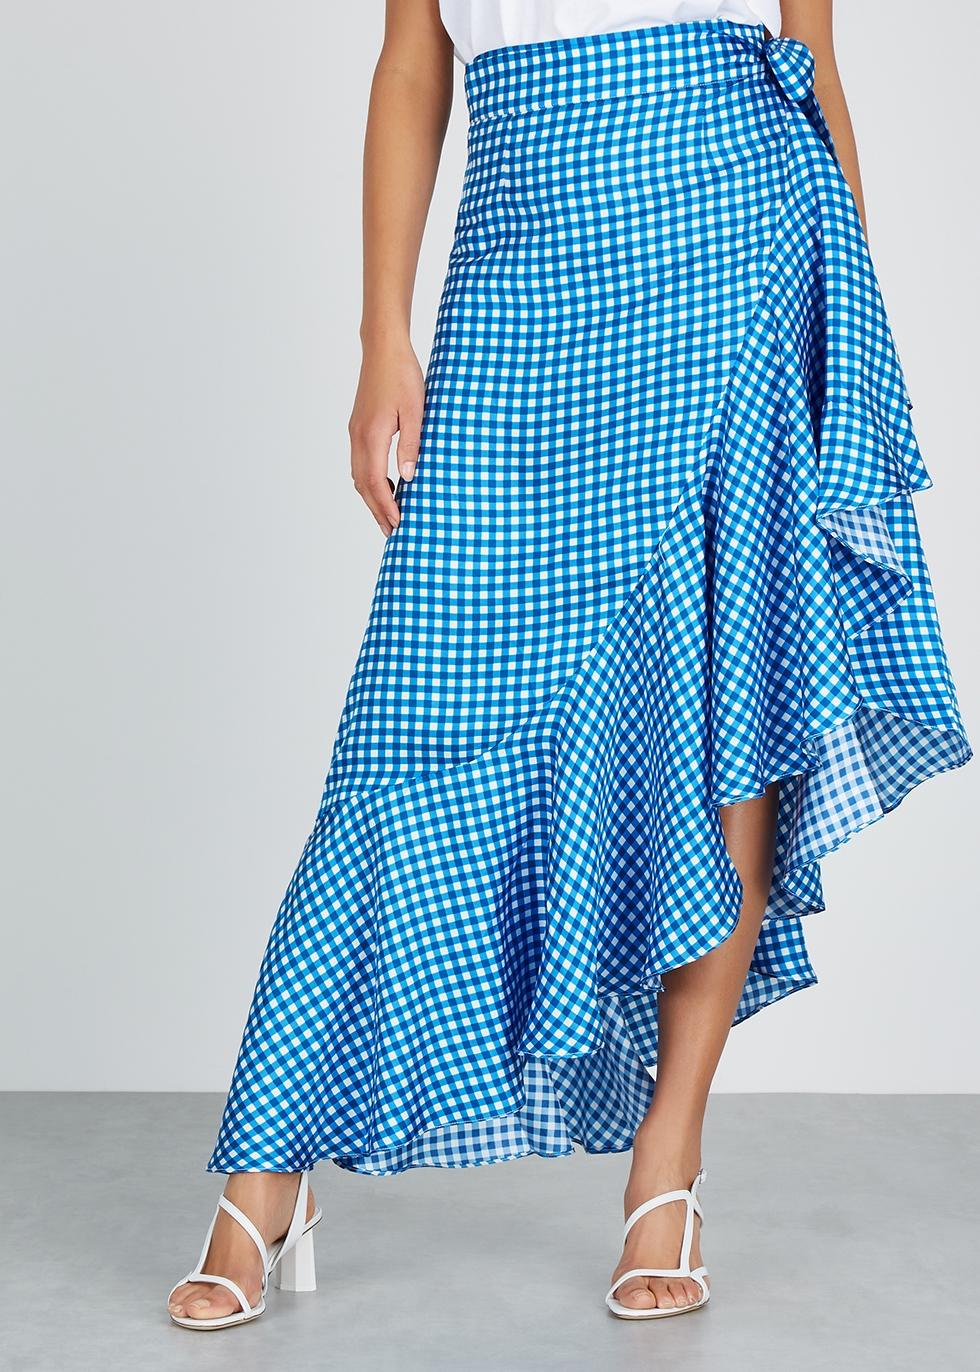 Lagos gingham silk midi skirt - PAPER LONDON